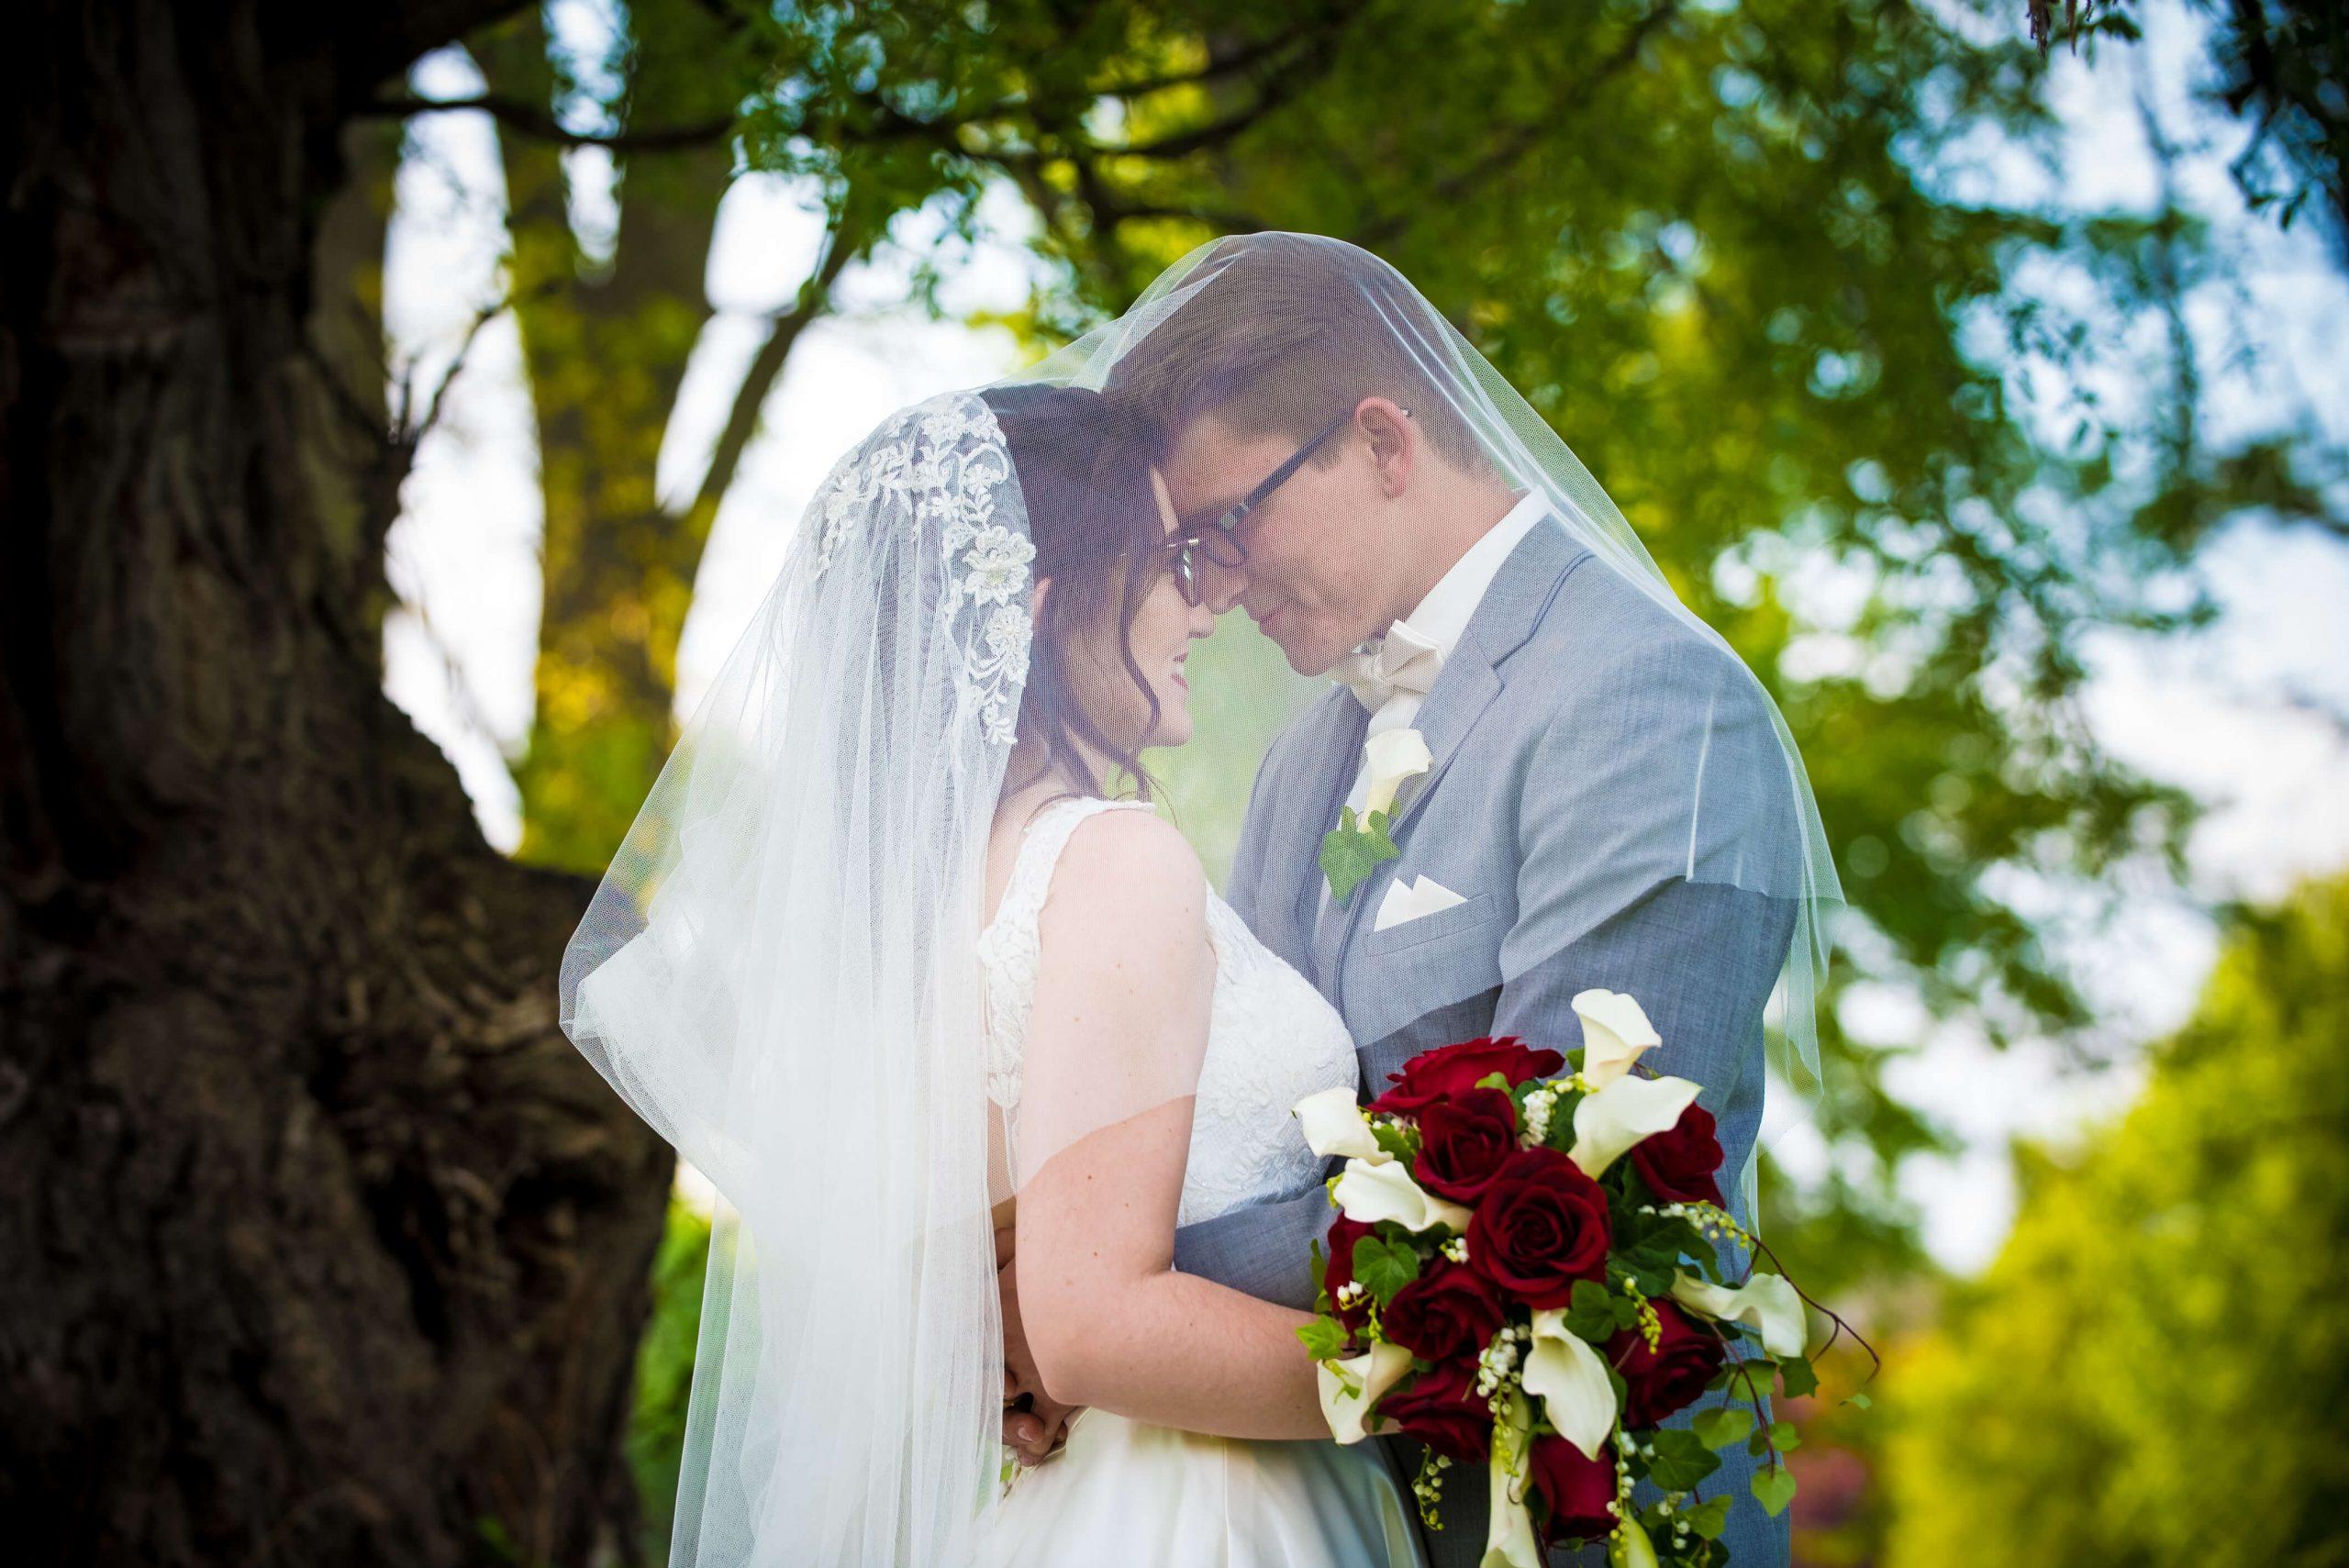 bride and groom under wedding veil